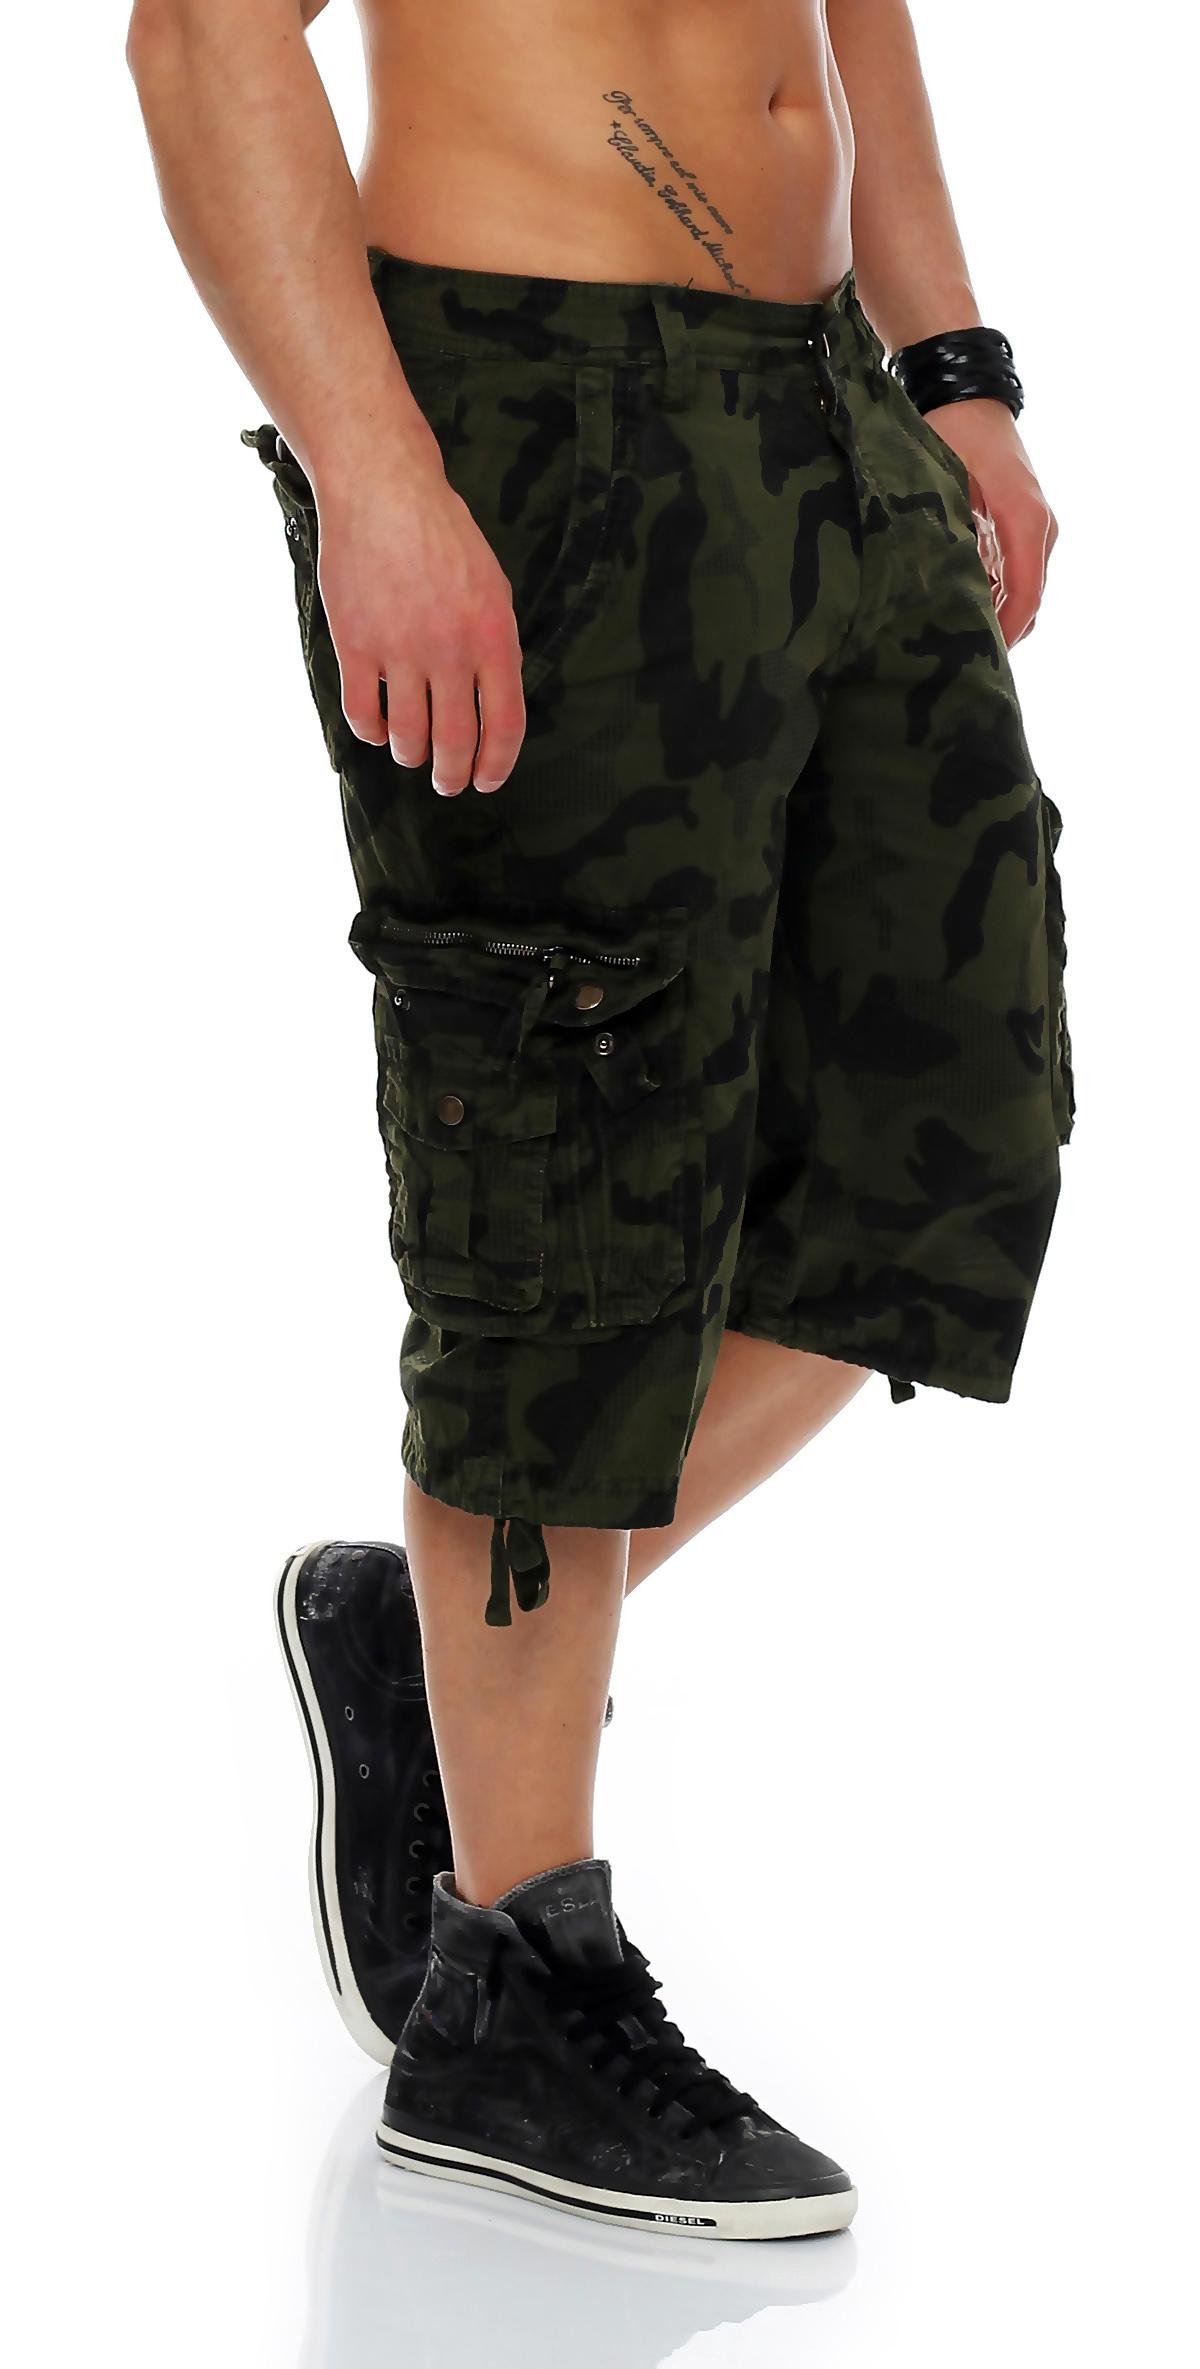 herren shorts kurze capri hose sommer 3 4 bermuda. Black Bedroom Furniture Sets. Home Design Ideas